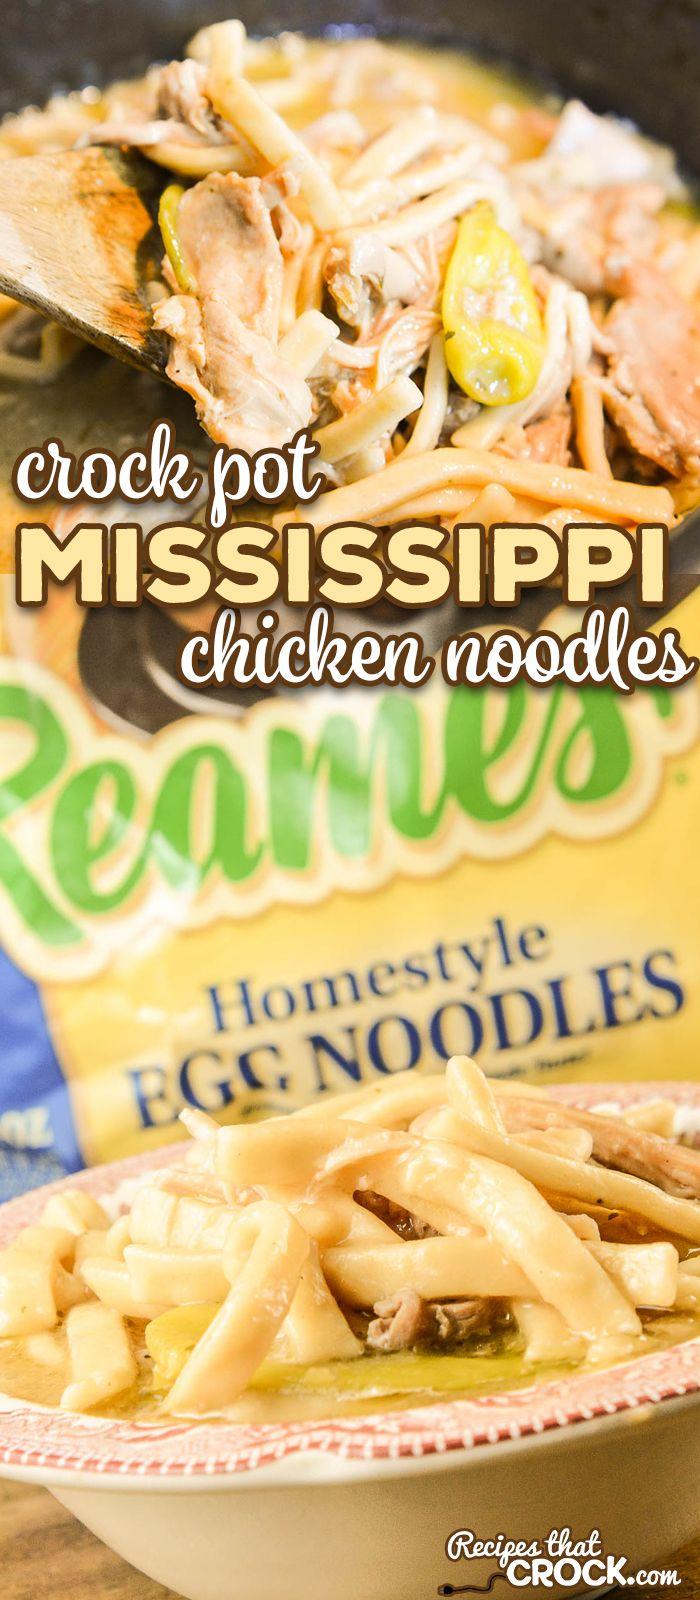 https://www.recipesthatcrock.com/crock-pot-mississippi-chicken-noodles/